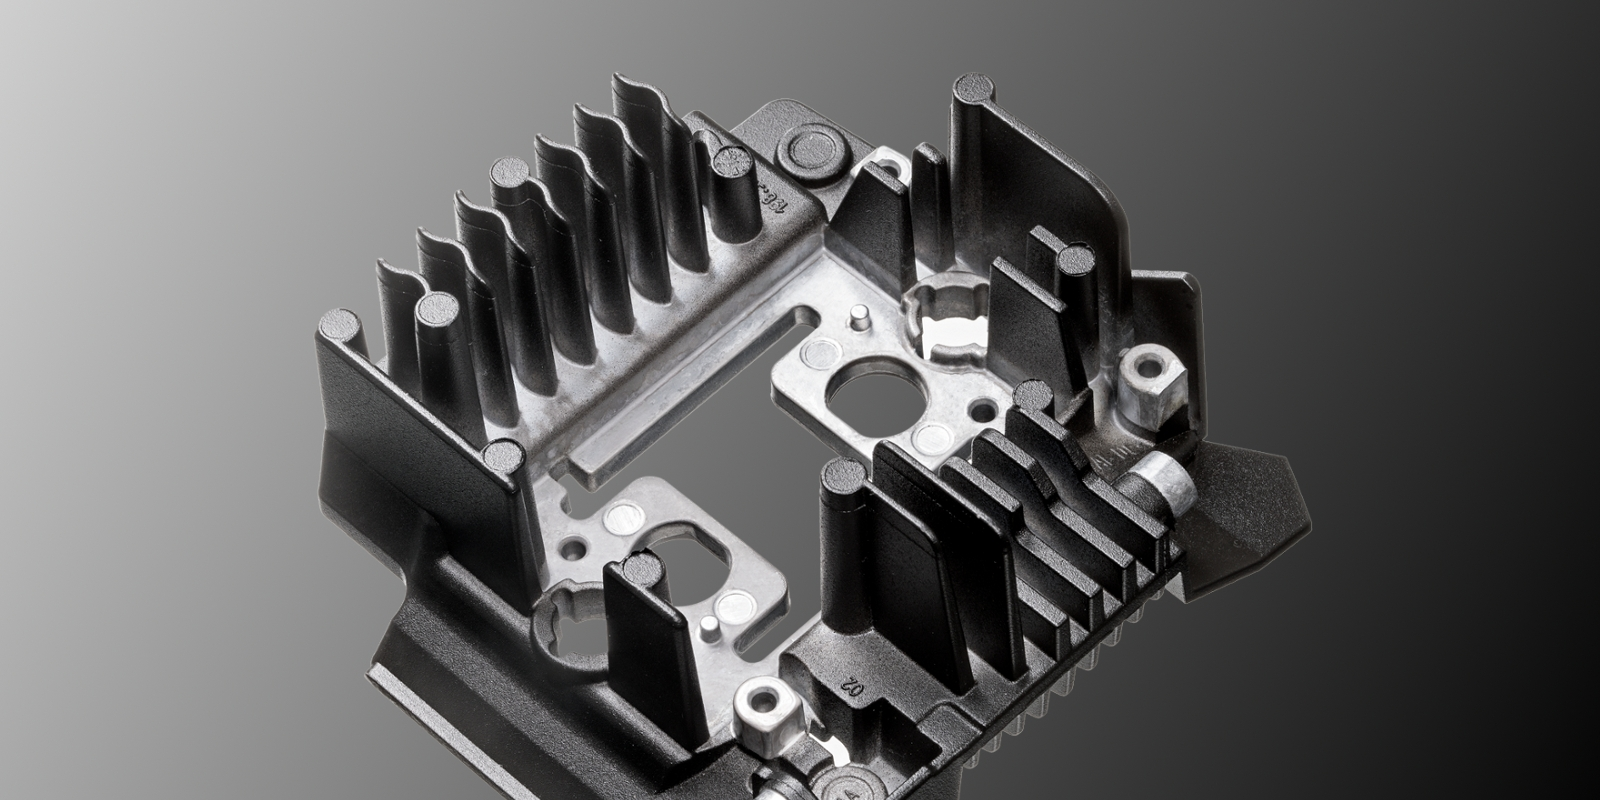 https://hdo-gmbh.com/wp-content/uploads/HDO_Automotive_Lichttechnik_Kuehlkoerper6.jpg